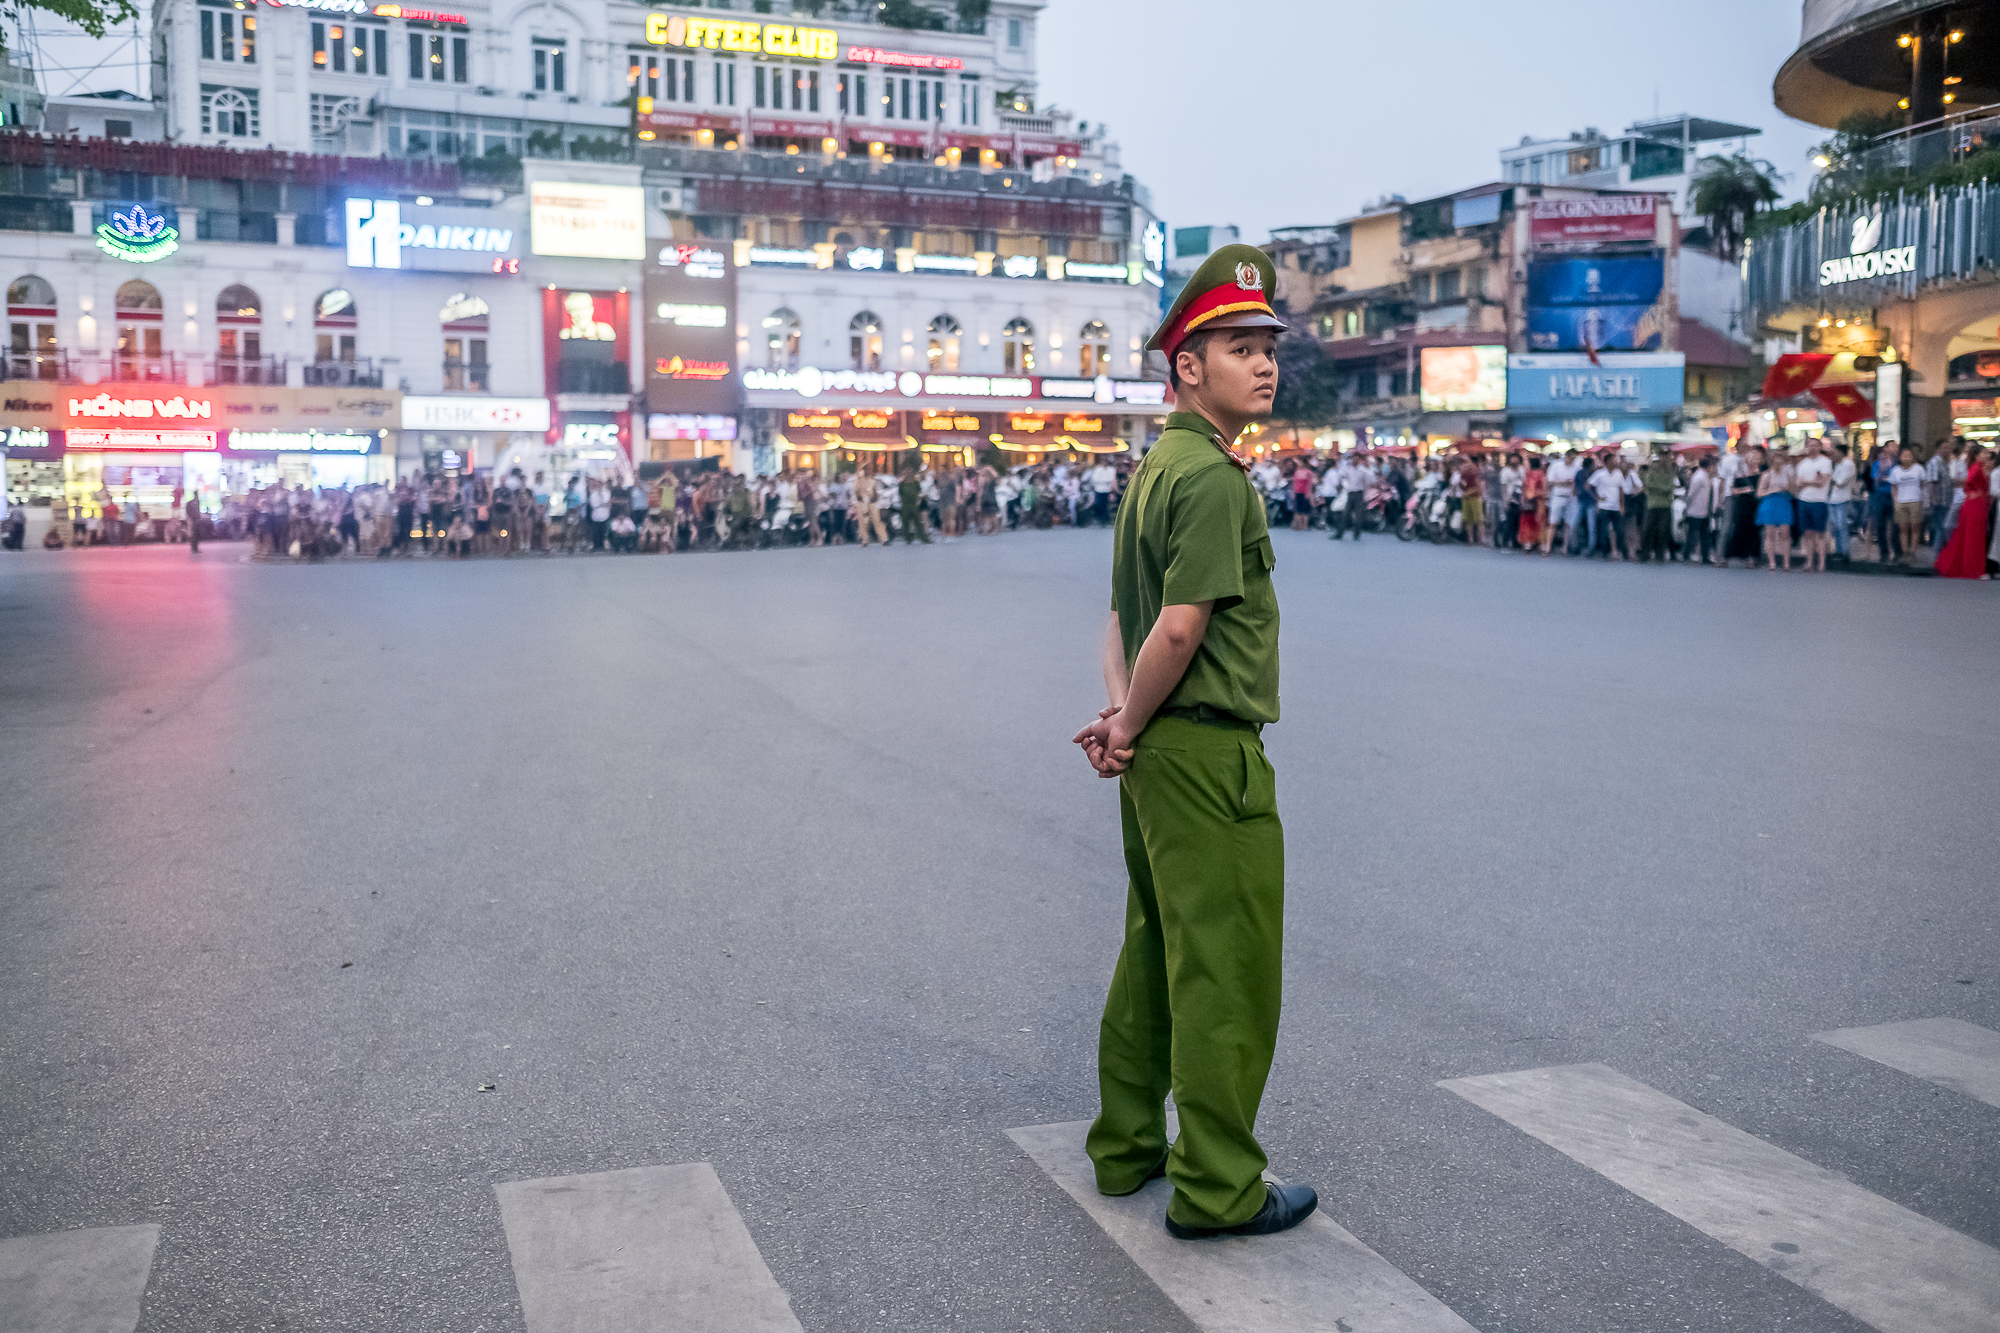 Vietnam_Honeymoon_TheOutsiderBlog_DSCF8166.JPG